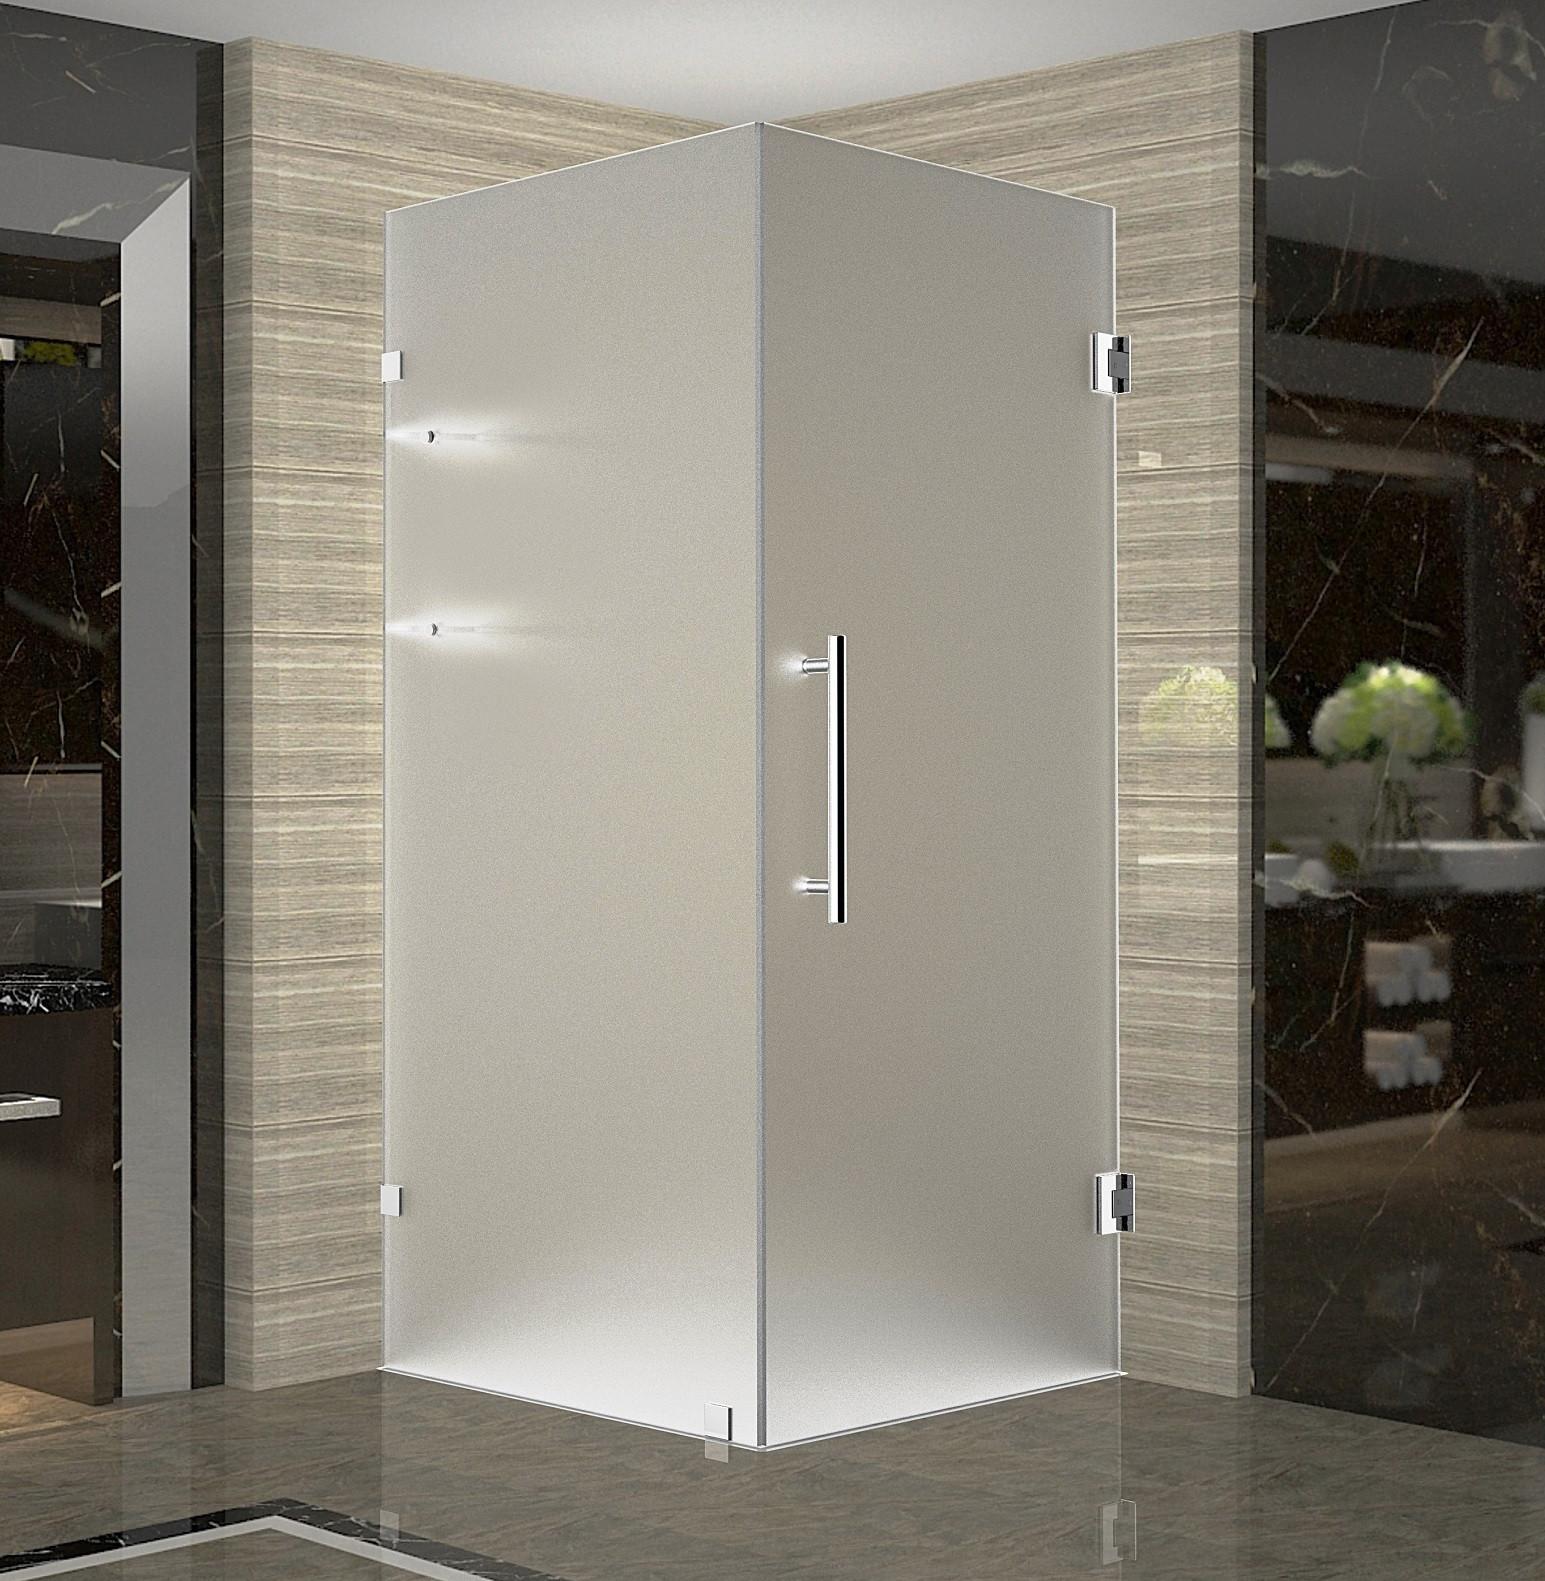 Aston Global SEN993F-CH-30-10 Chrome Completely Frameless Square Shower Enclosure with Shelves